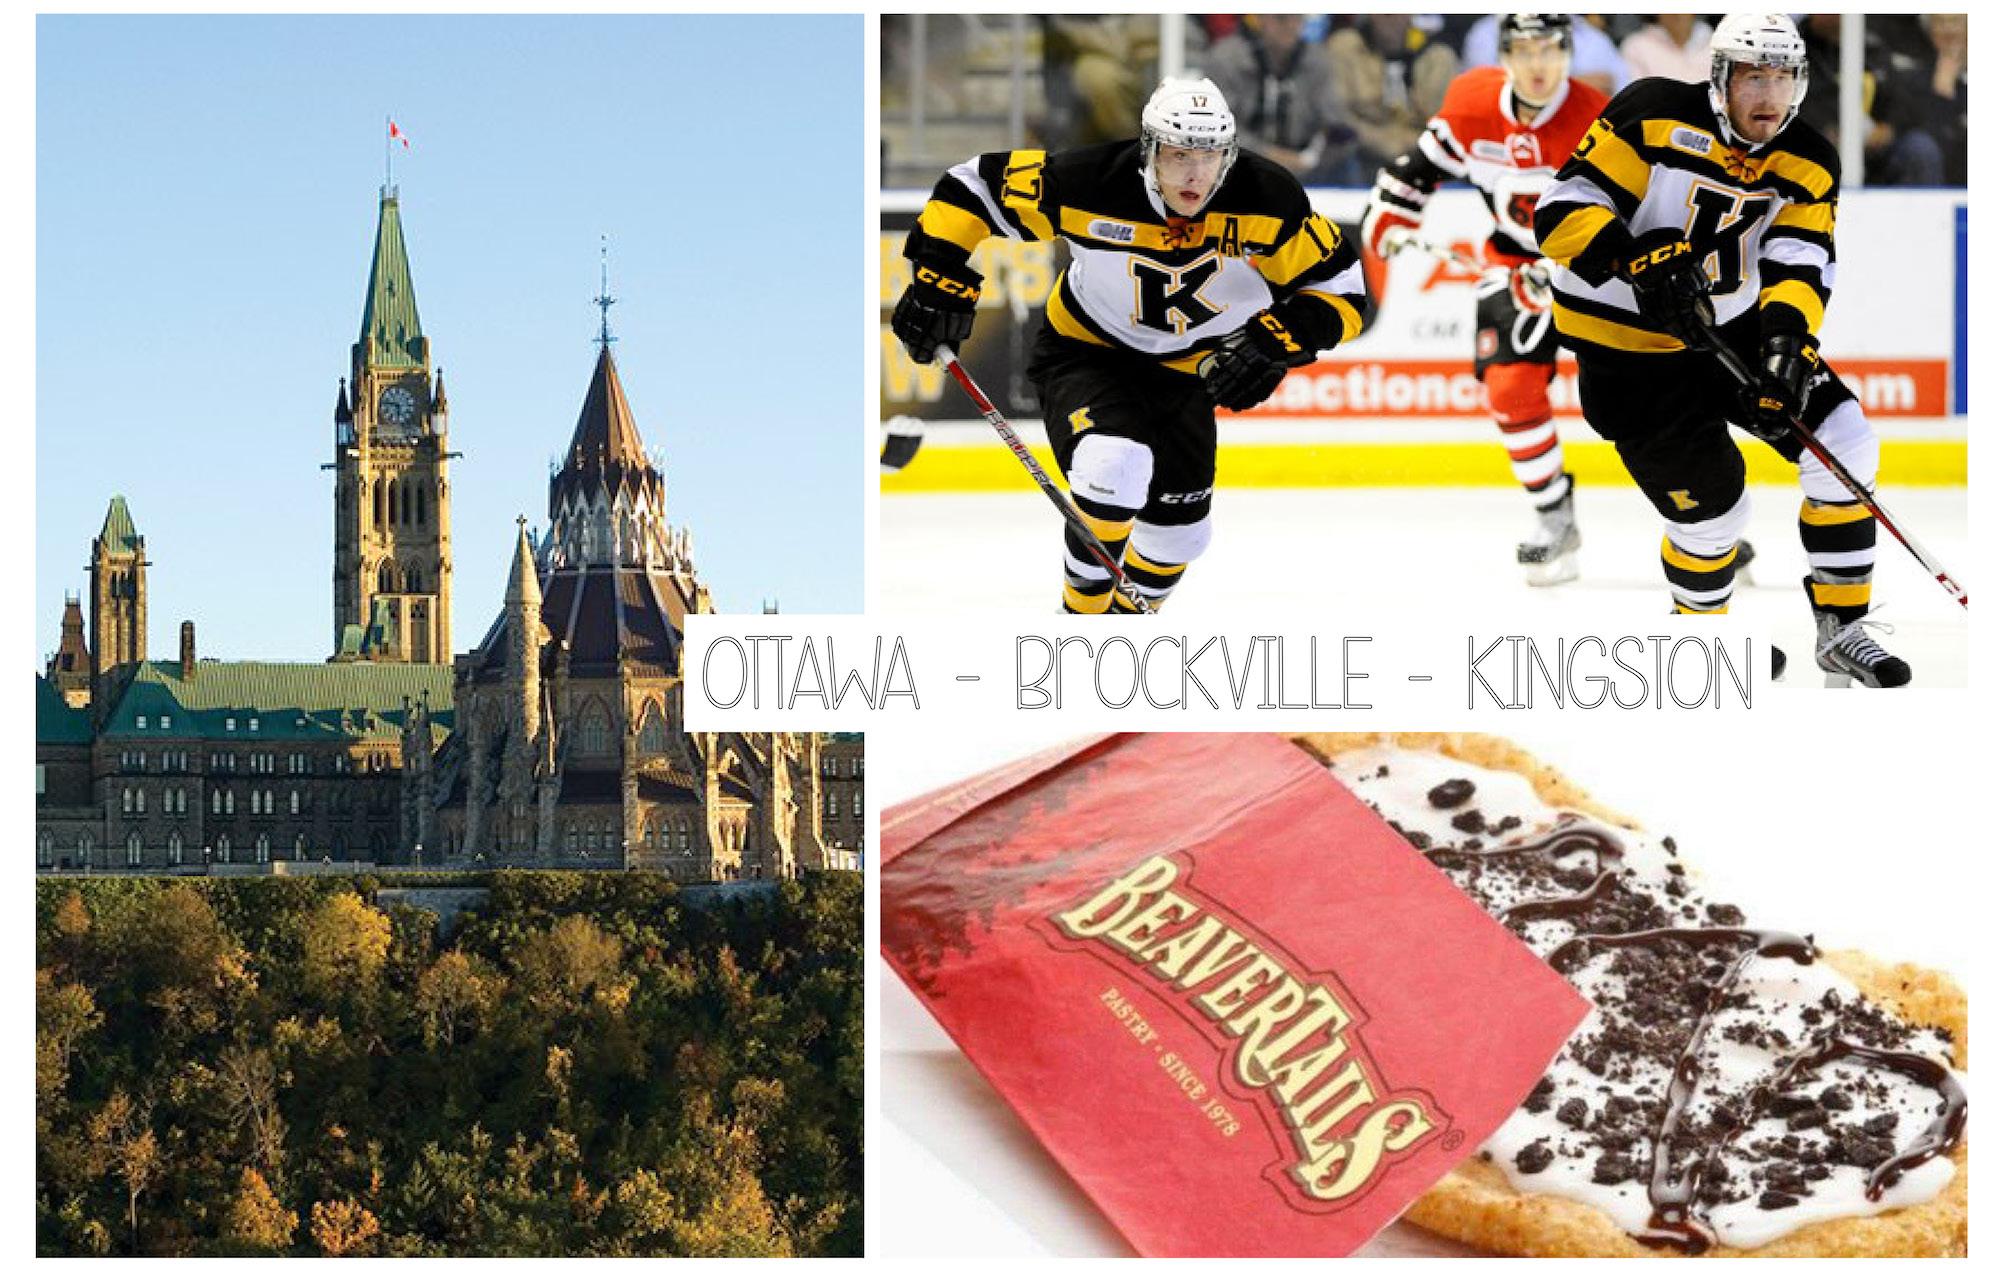 Road Trip Canada USA - Ottawa